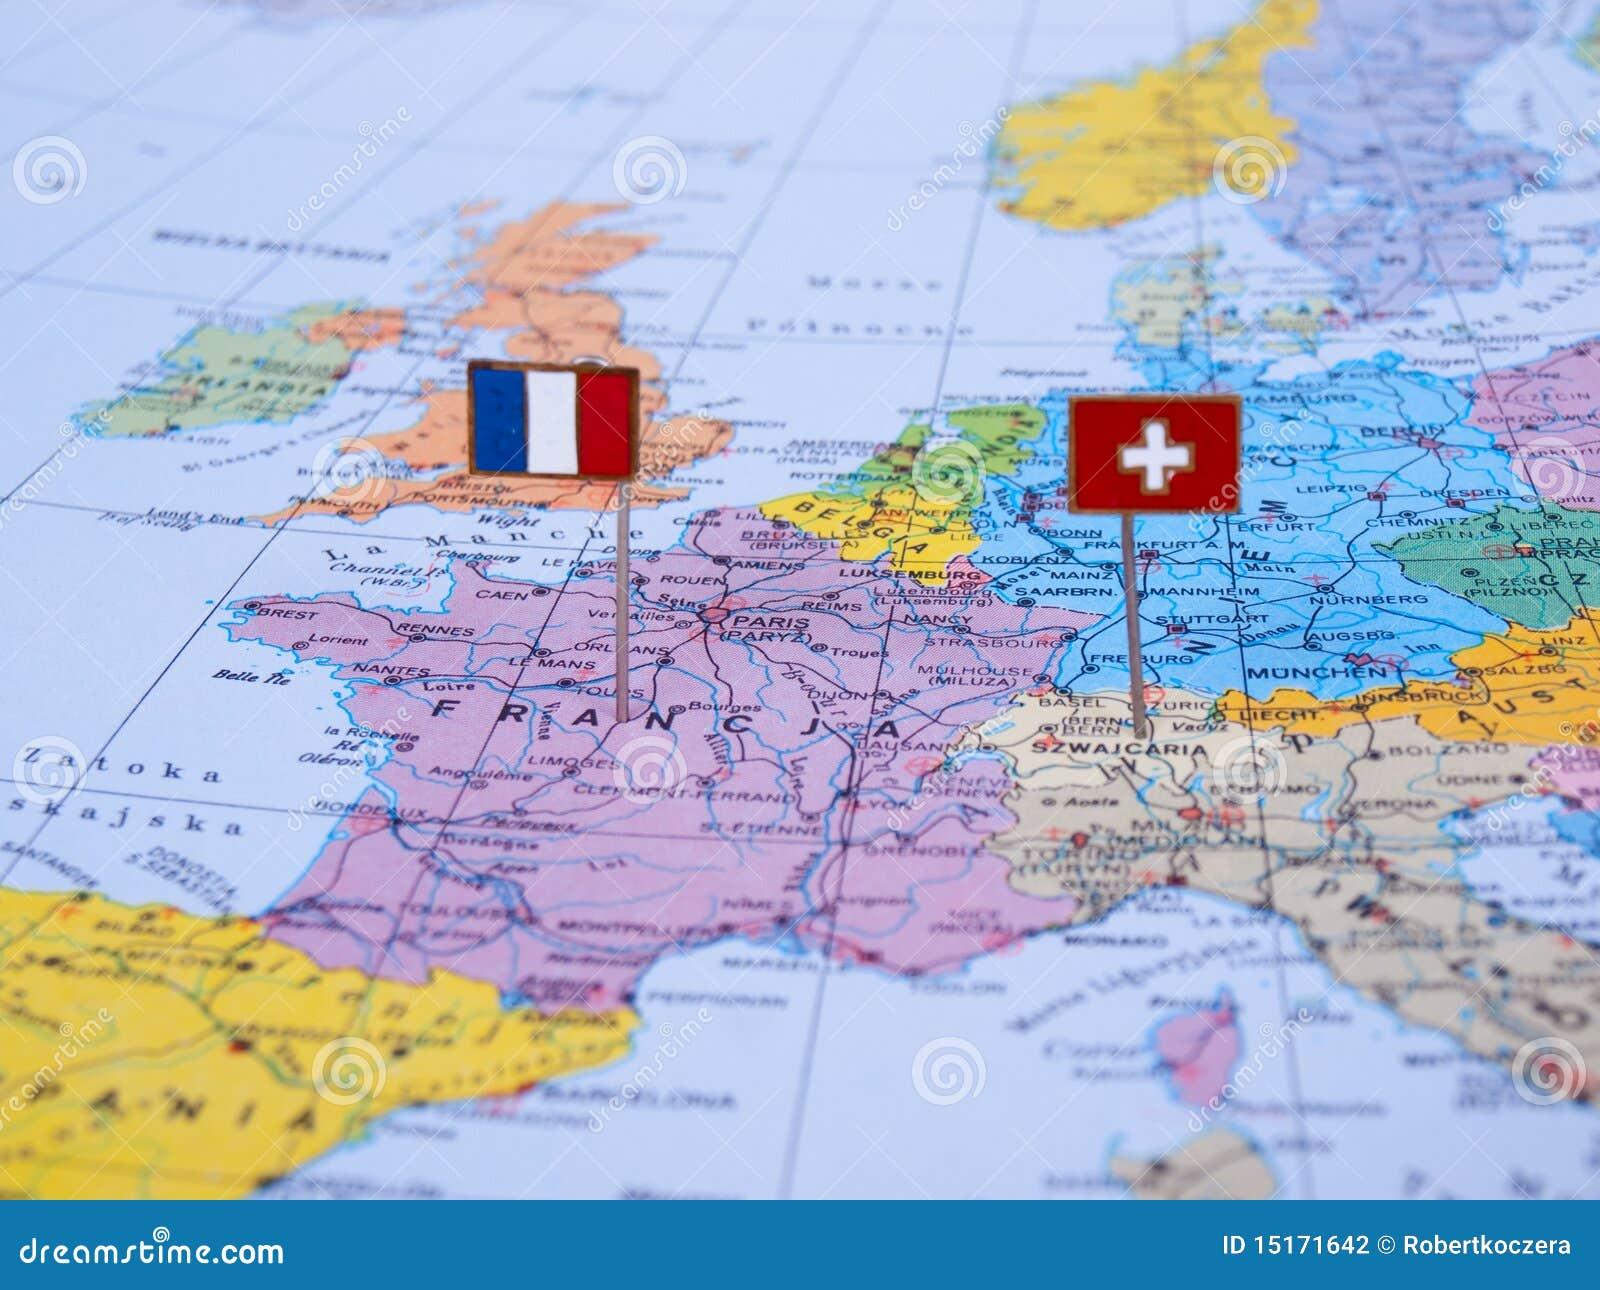 Map Of France Switzerland.France And Switzerland On The Map Stock Photo Image Of Travel